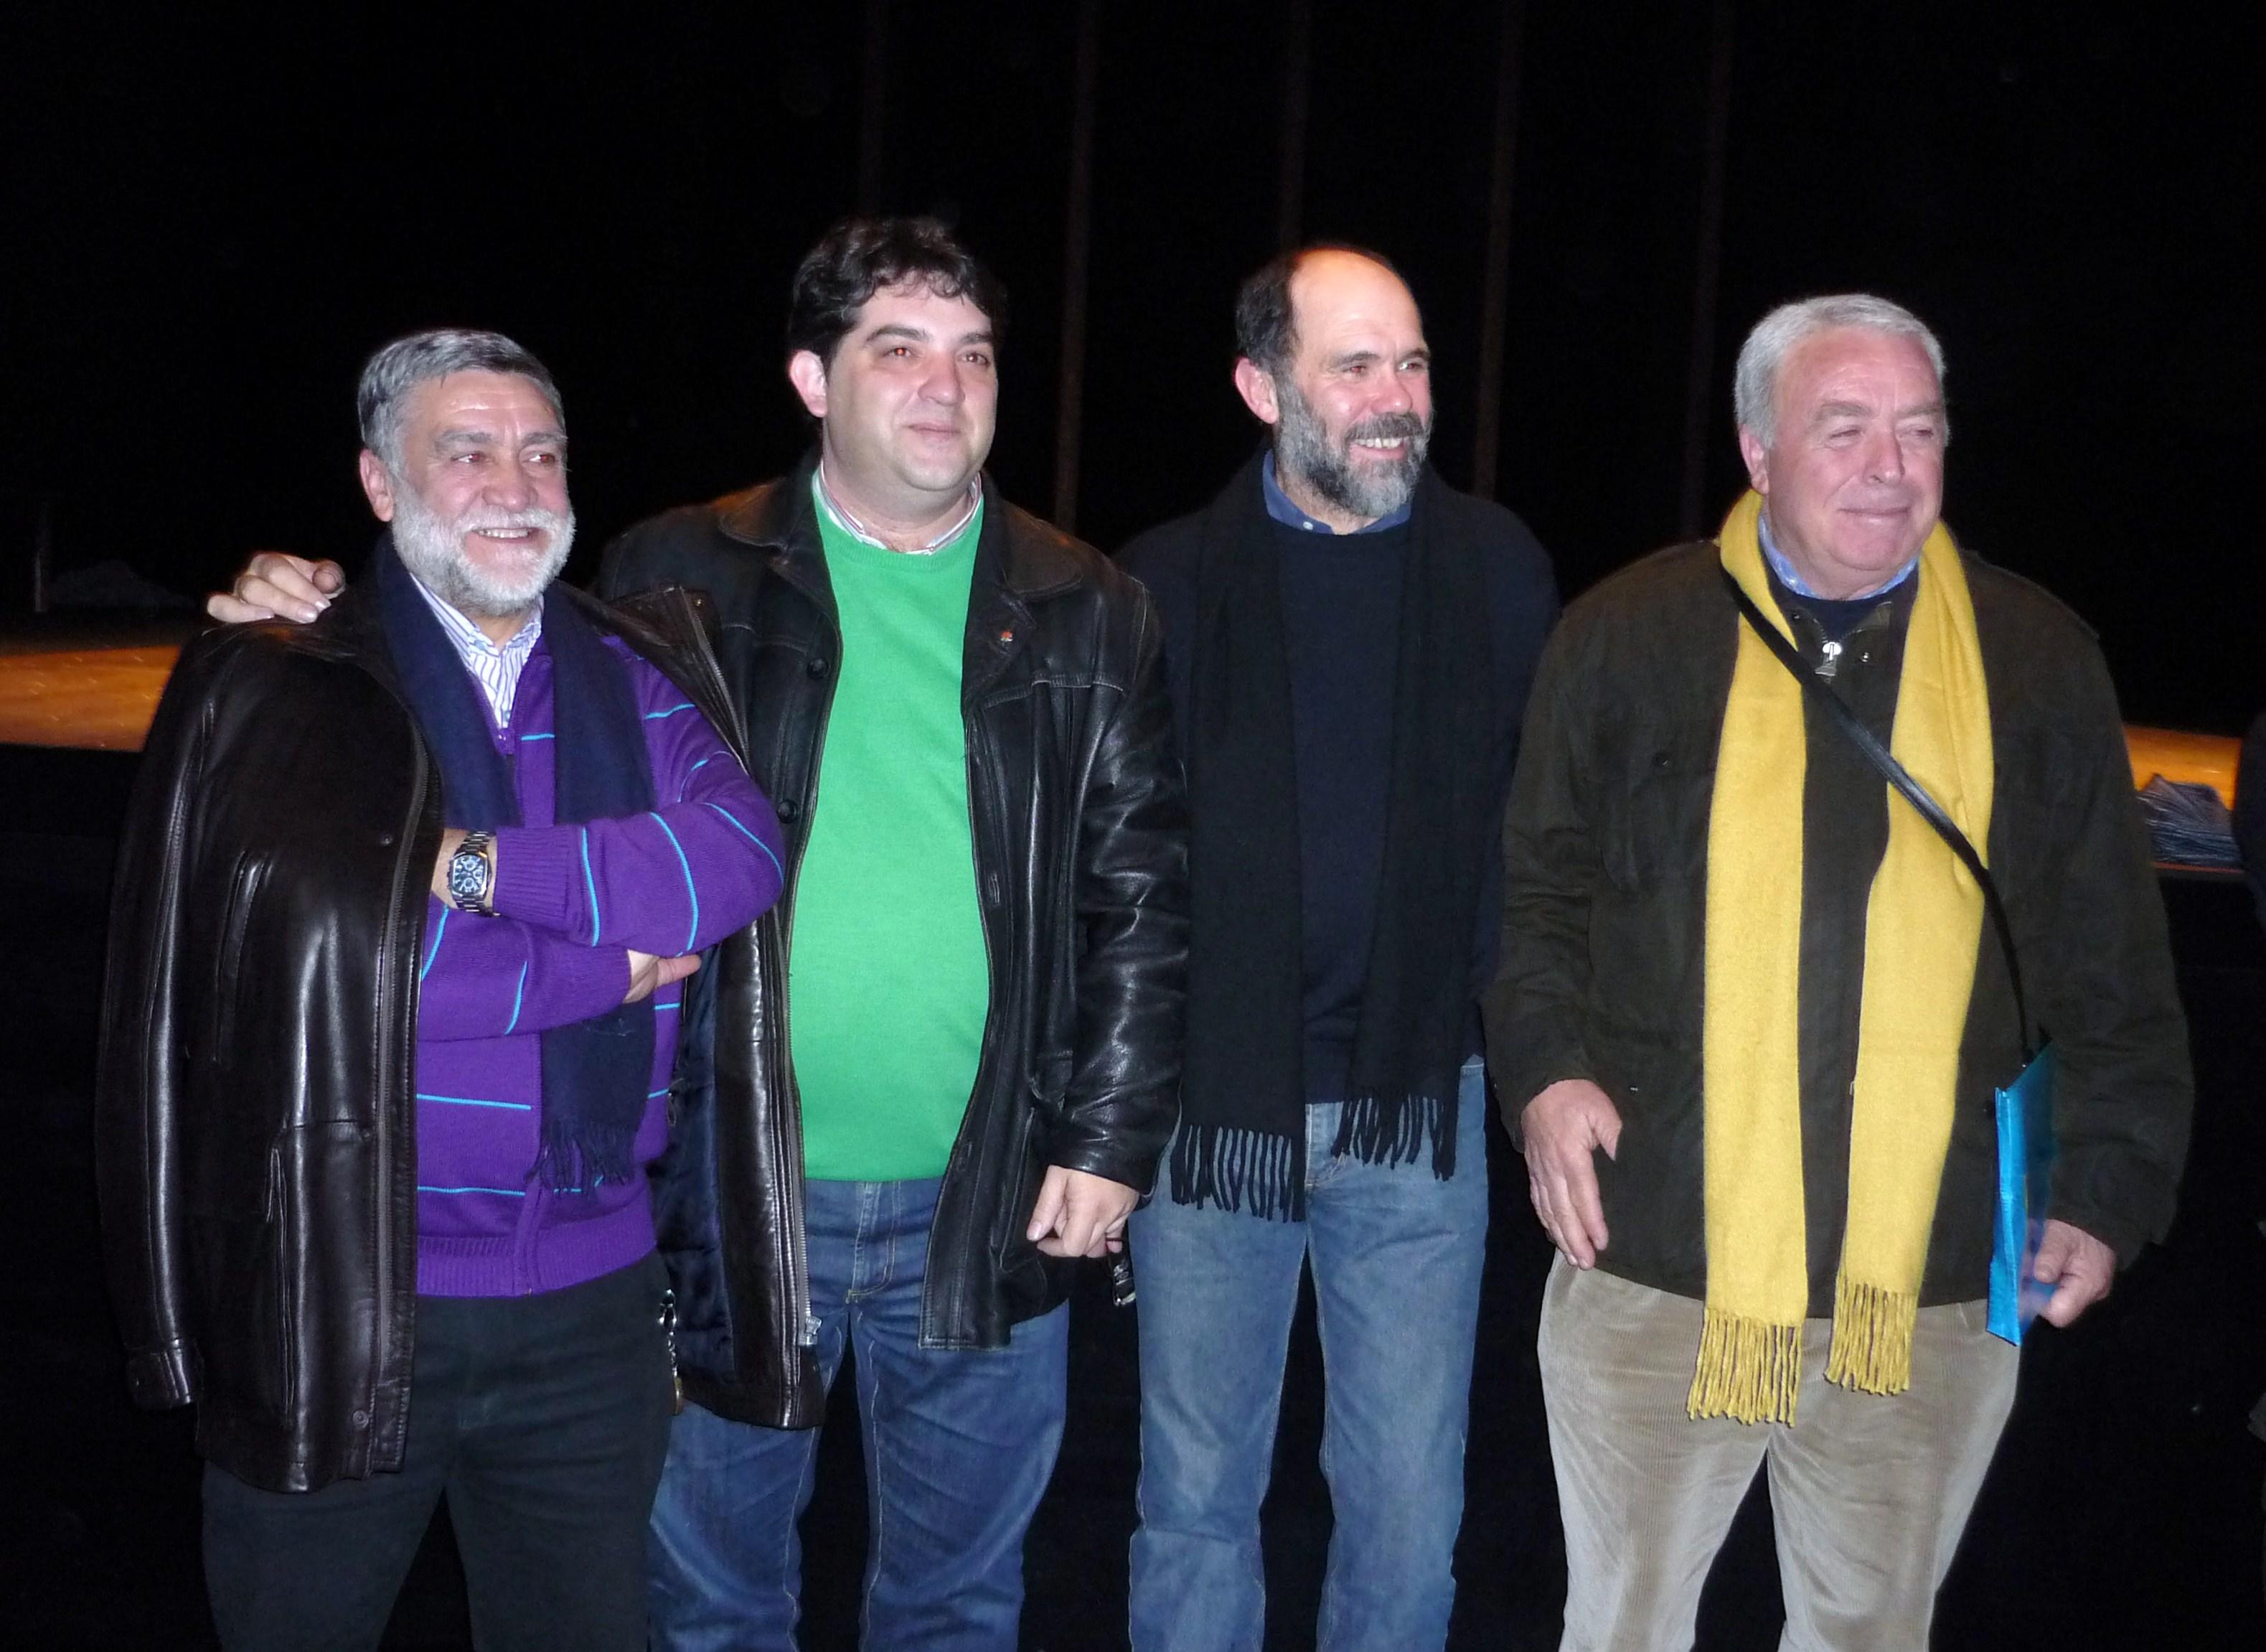 Cuatro alcaldes de Zalamea